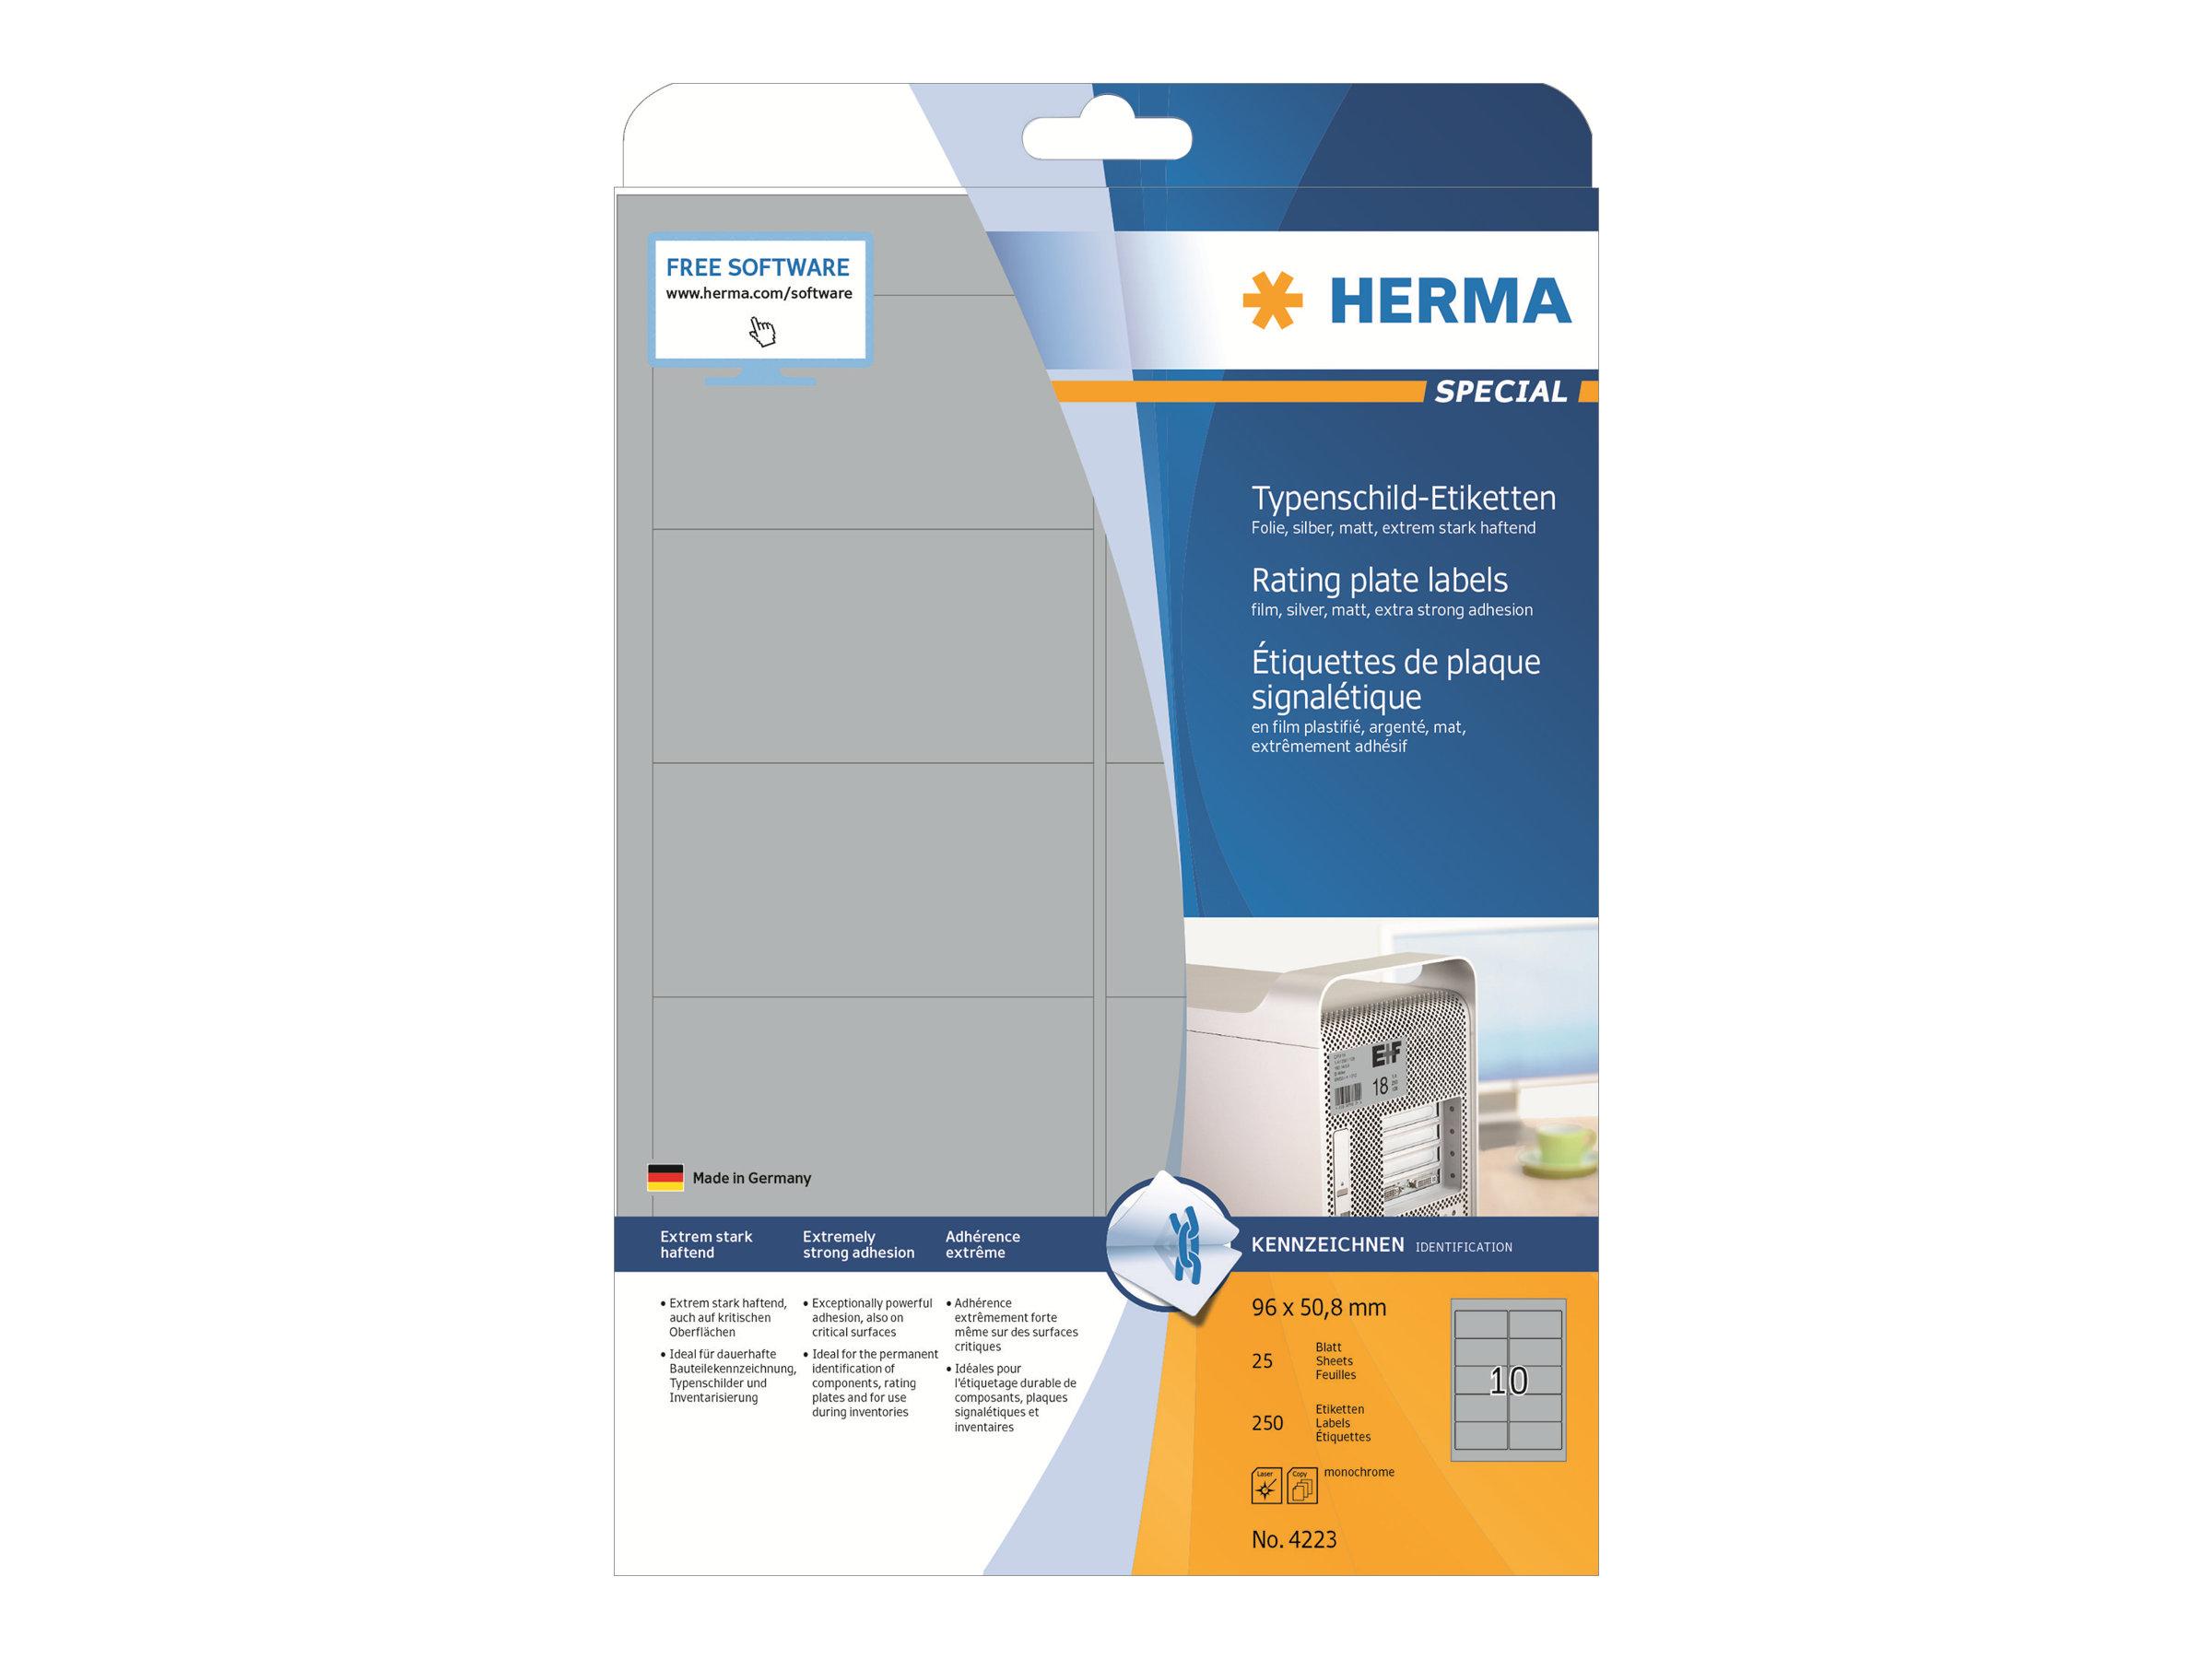 HERMA Special - Polyester - matt - permanent selbstklebend - Silber - 96 x 50.8 mm 250 Etikett(en) (25 Bogen x 10)